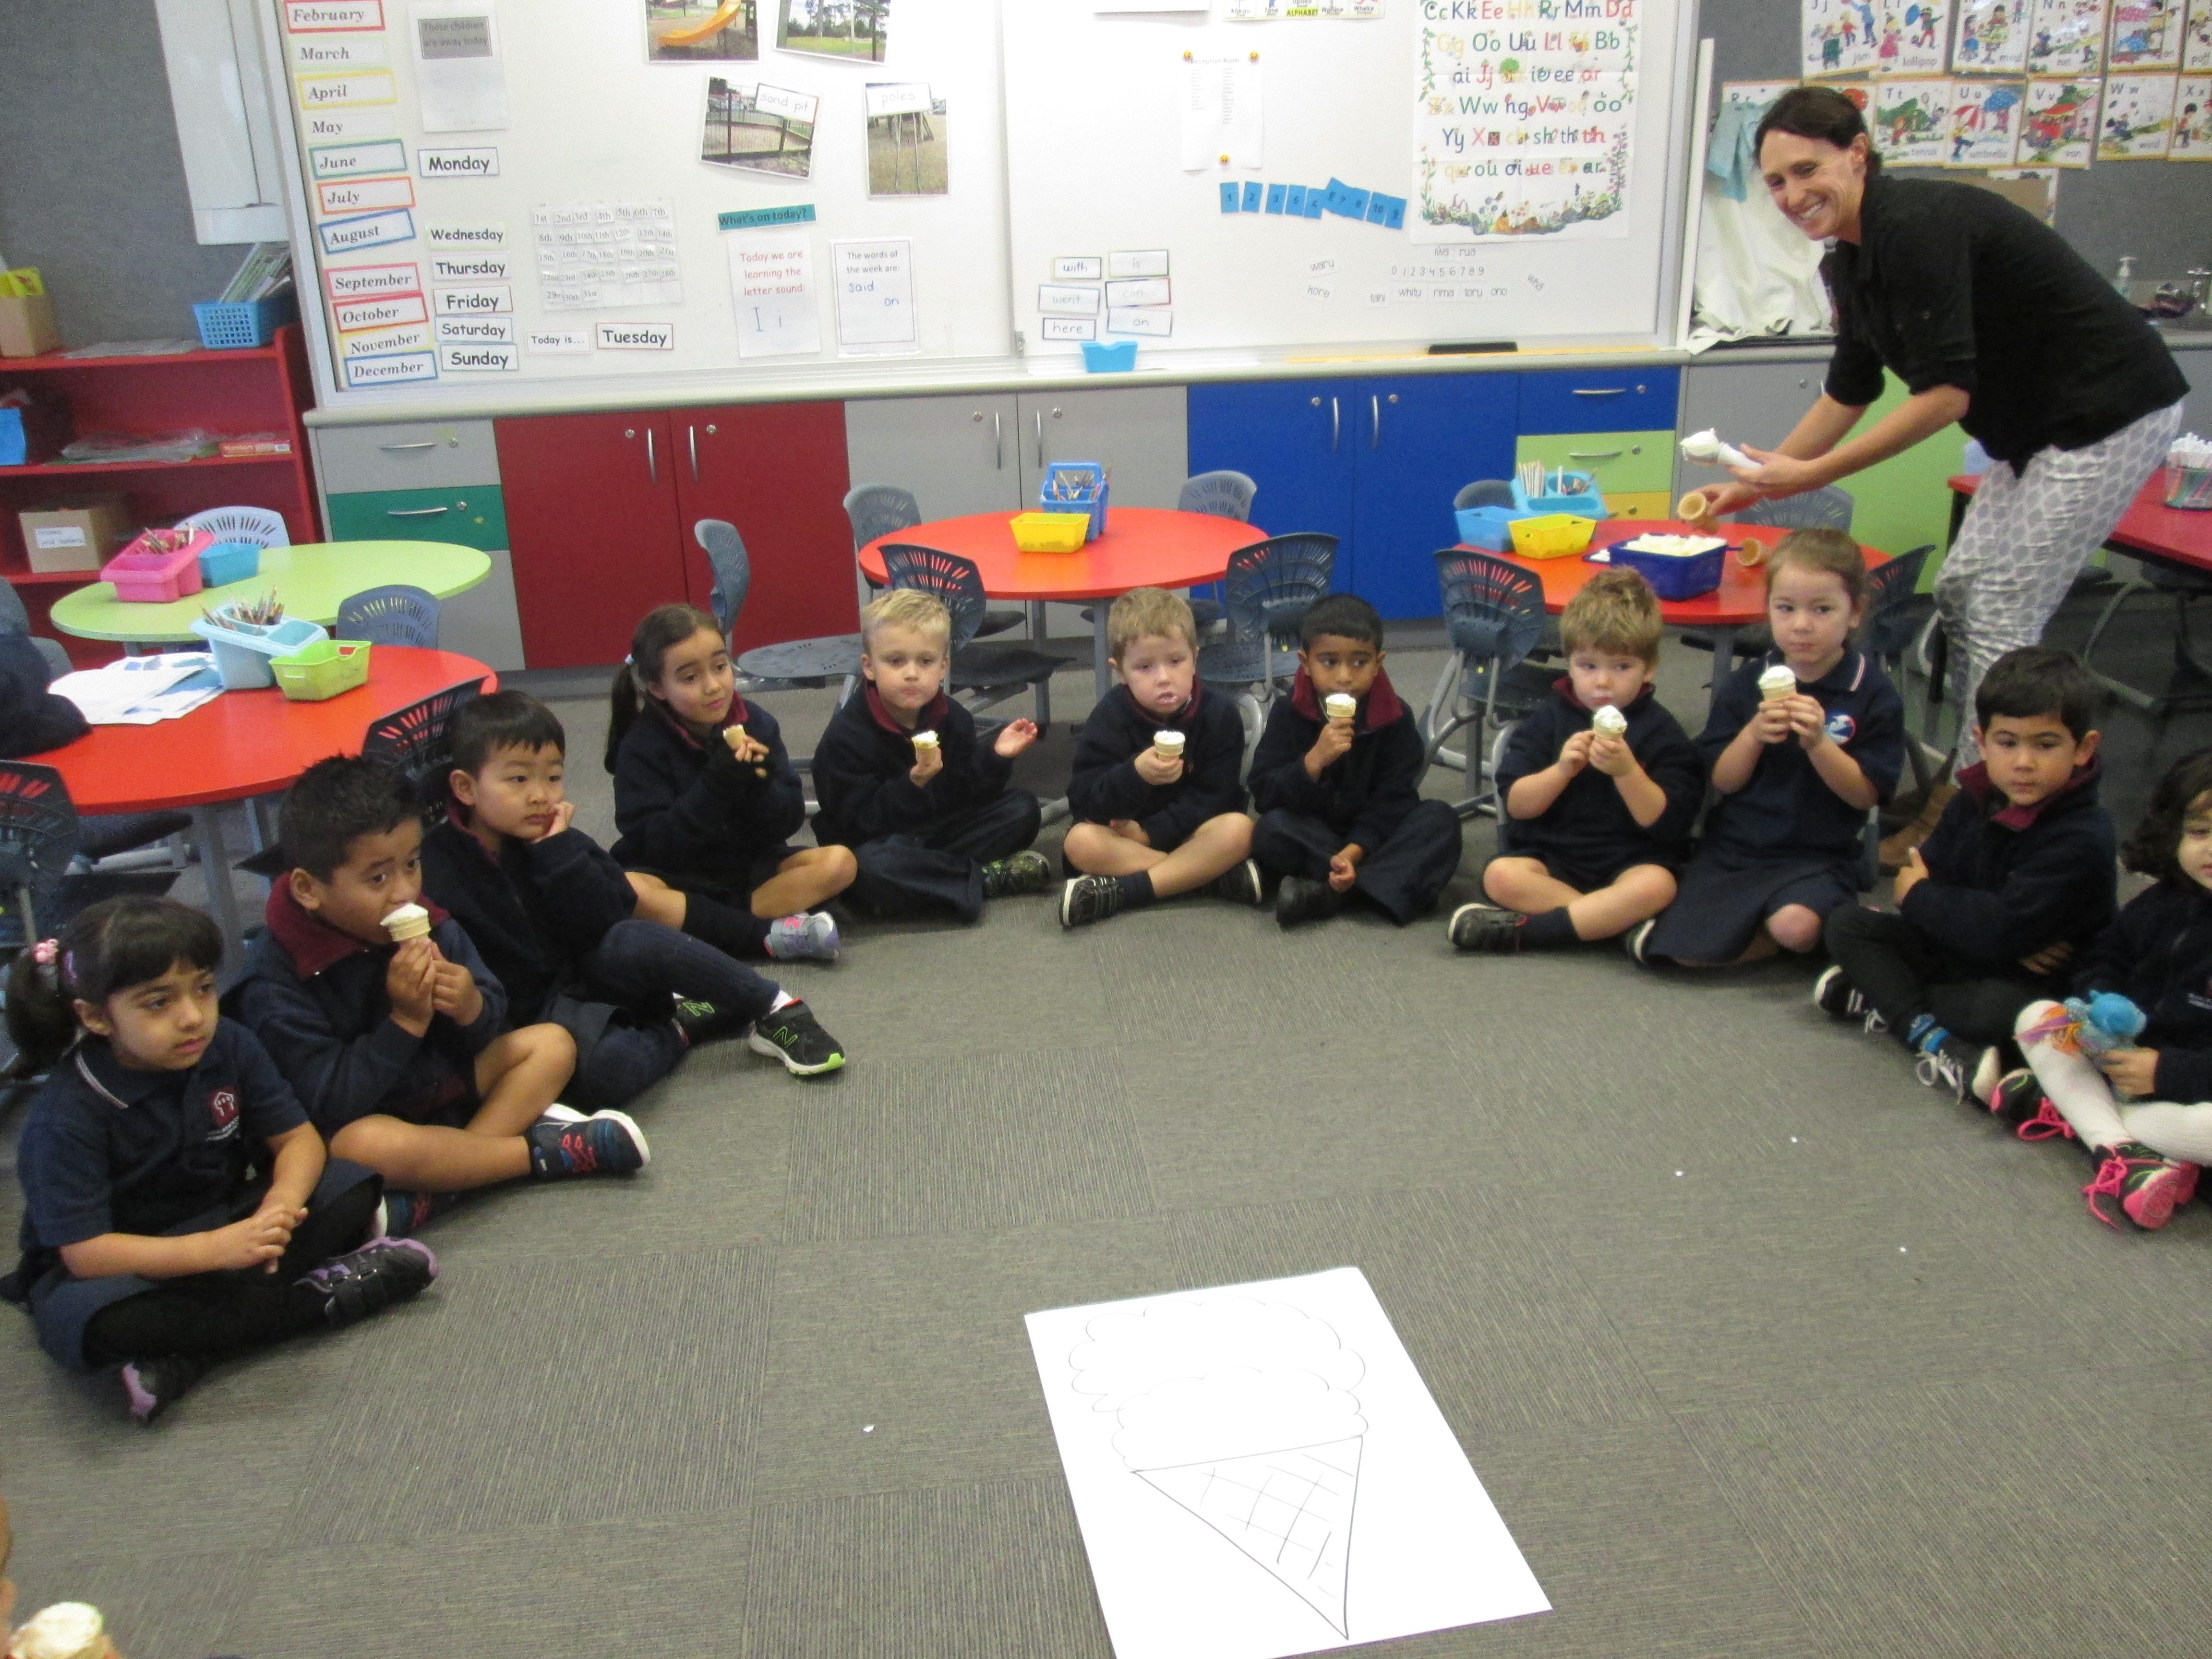 Blockhouse Bay Primary School - Classroom fun!